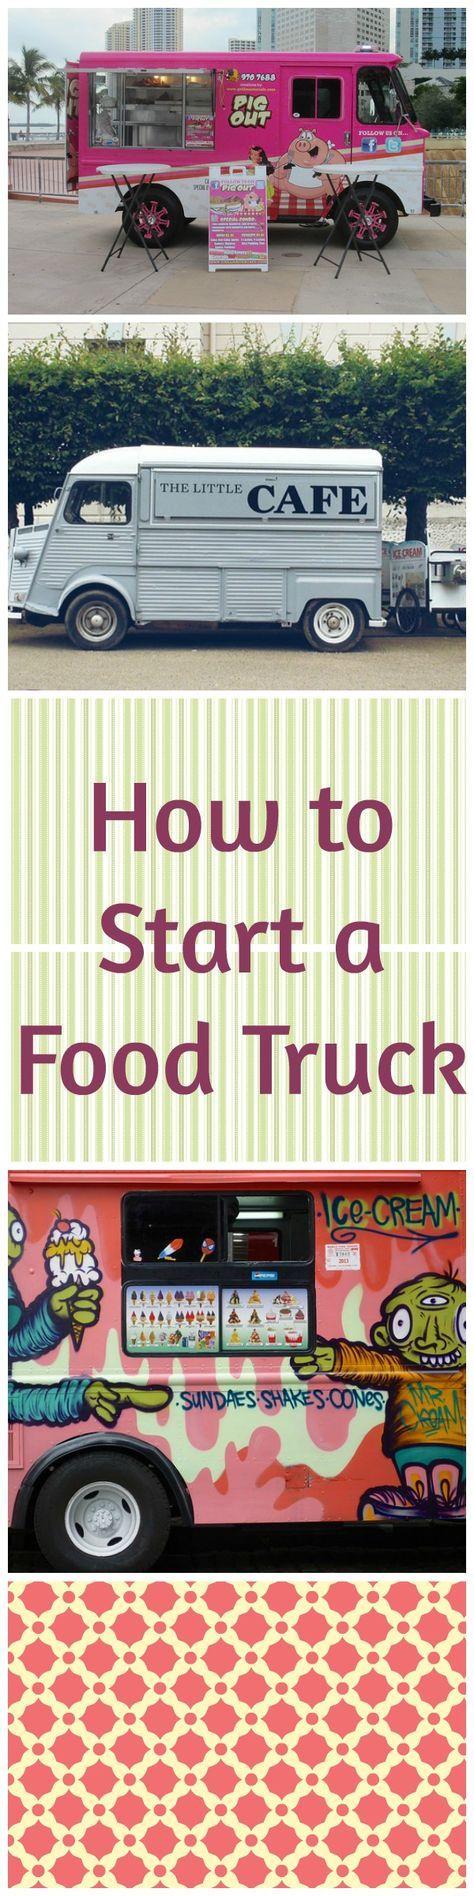 Reader asks how to start a food truck business Like and Repin. Thx Noelito Flow. http://www.instagram.com/noelitoflow